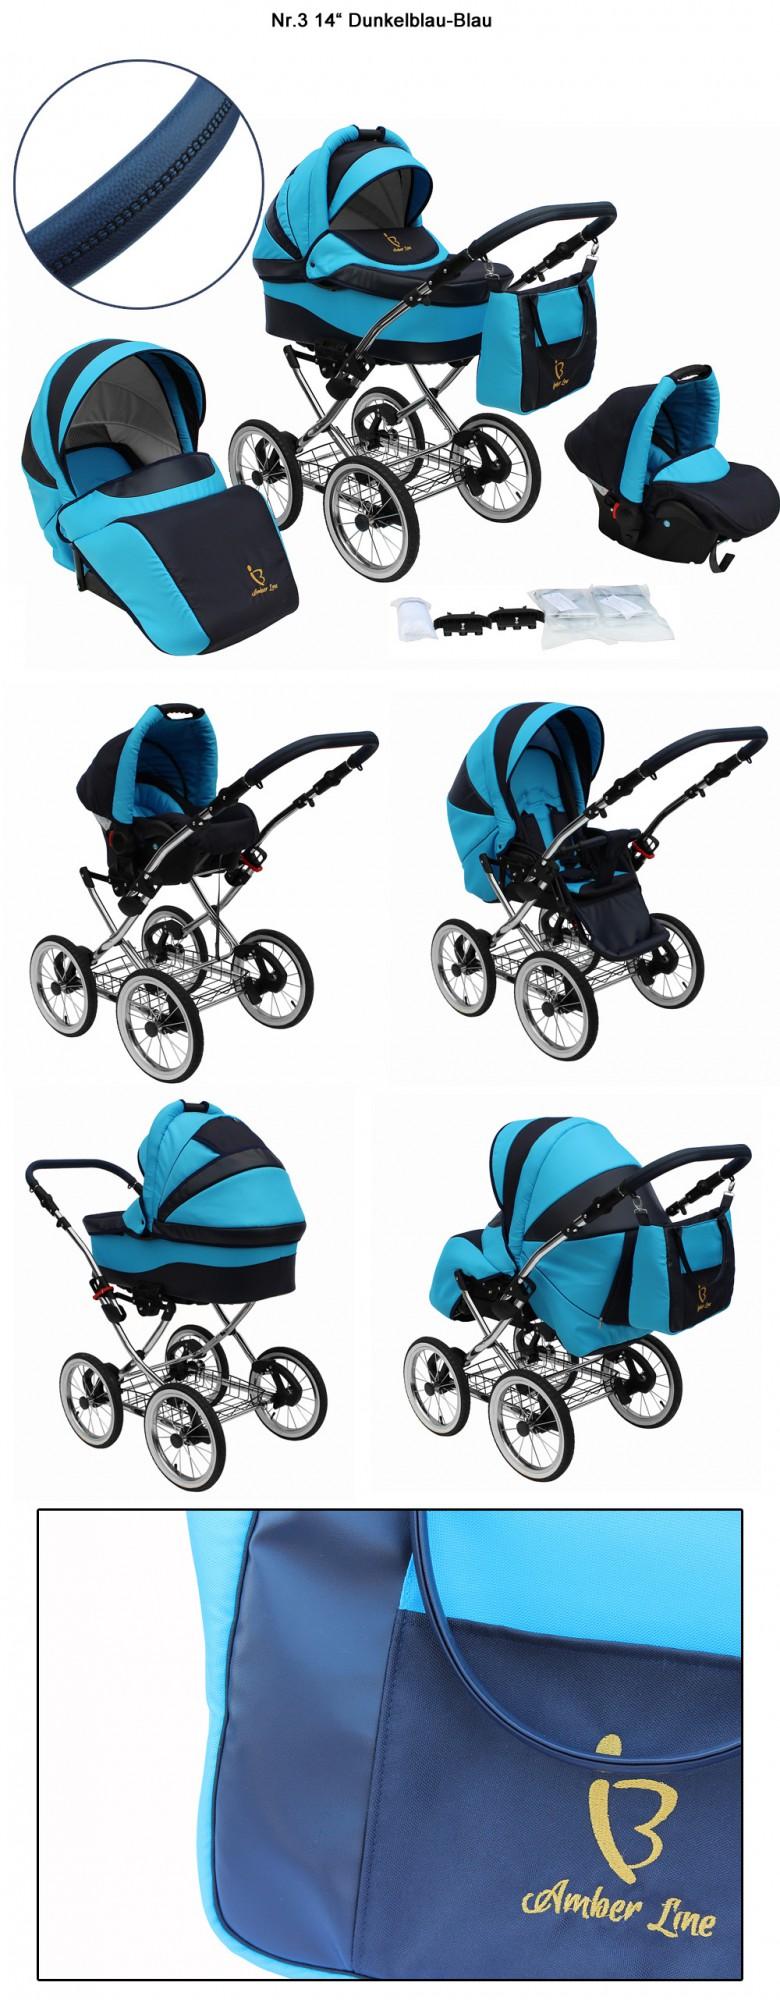 amber line kombikinderwagen 3in1 babyschale f r isofix kinderwagen mit leder ebay. Black Bedroom Furniture Sets. Home Design Ideas